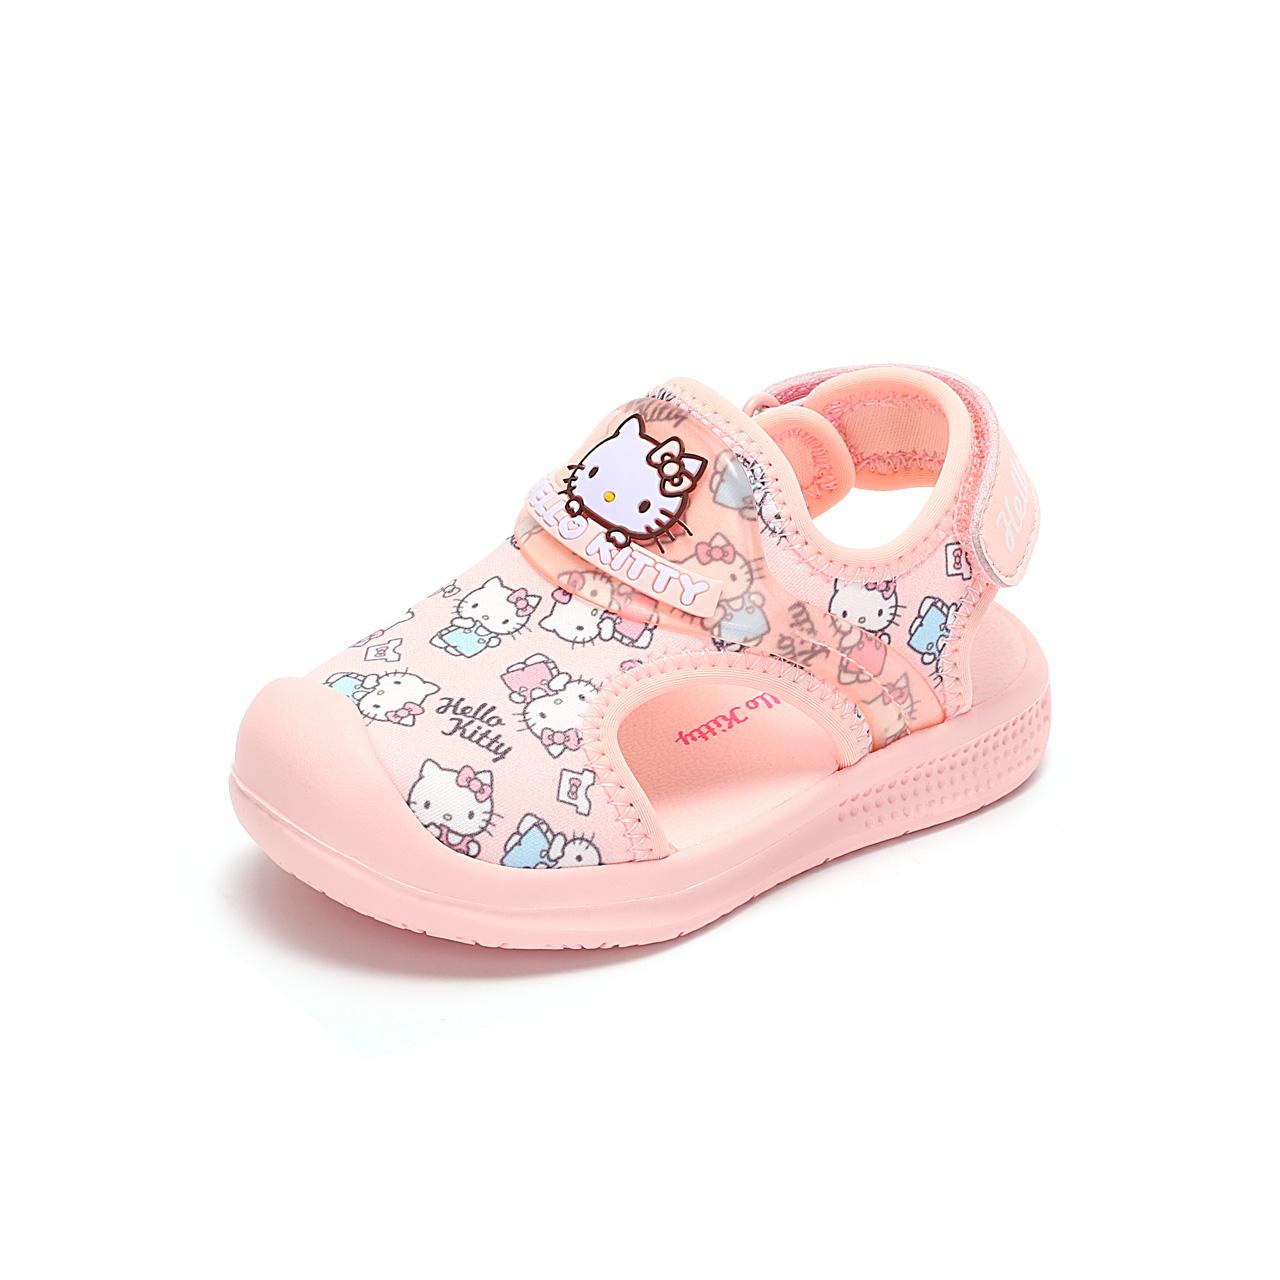 HelloKitty童鞋女童包头运动凉鞋夏季新款儿童宝宝沙滩鞋